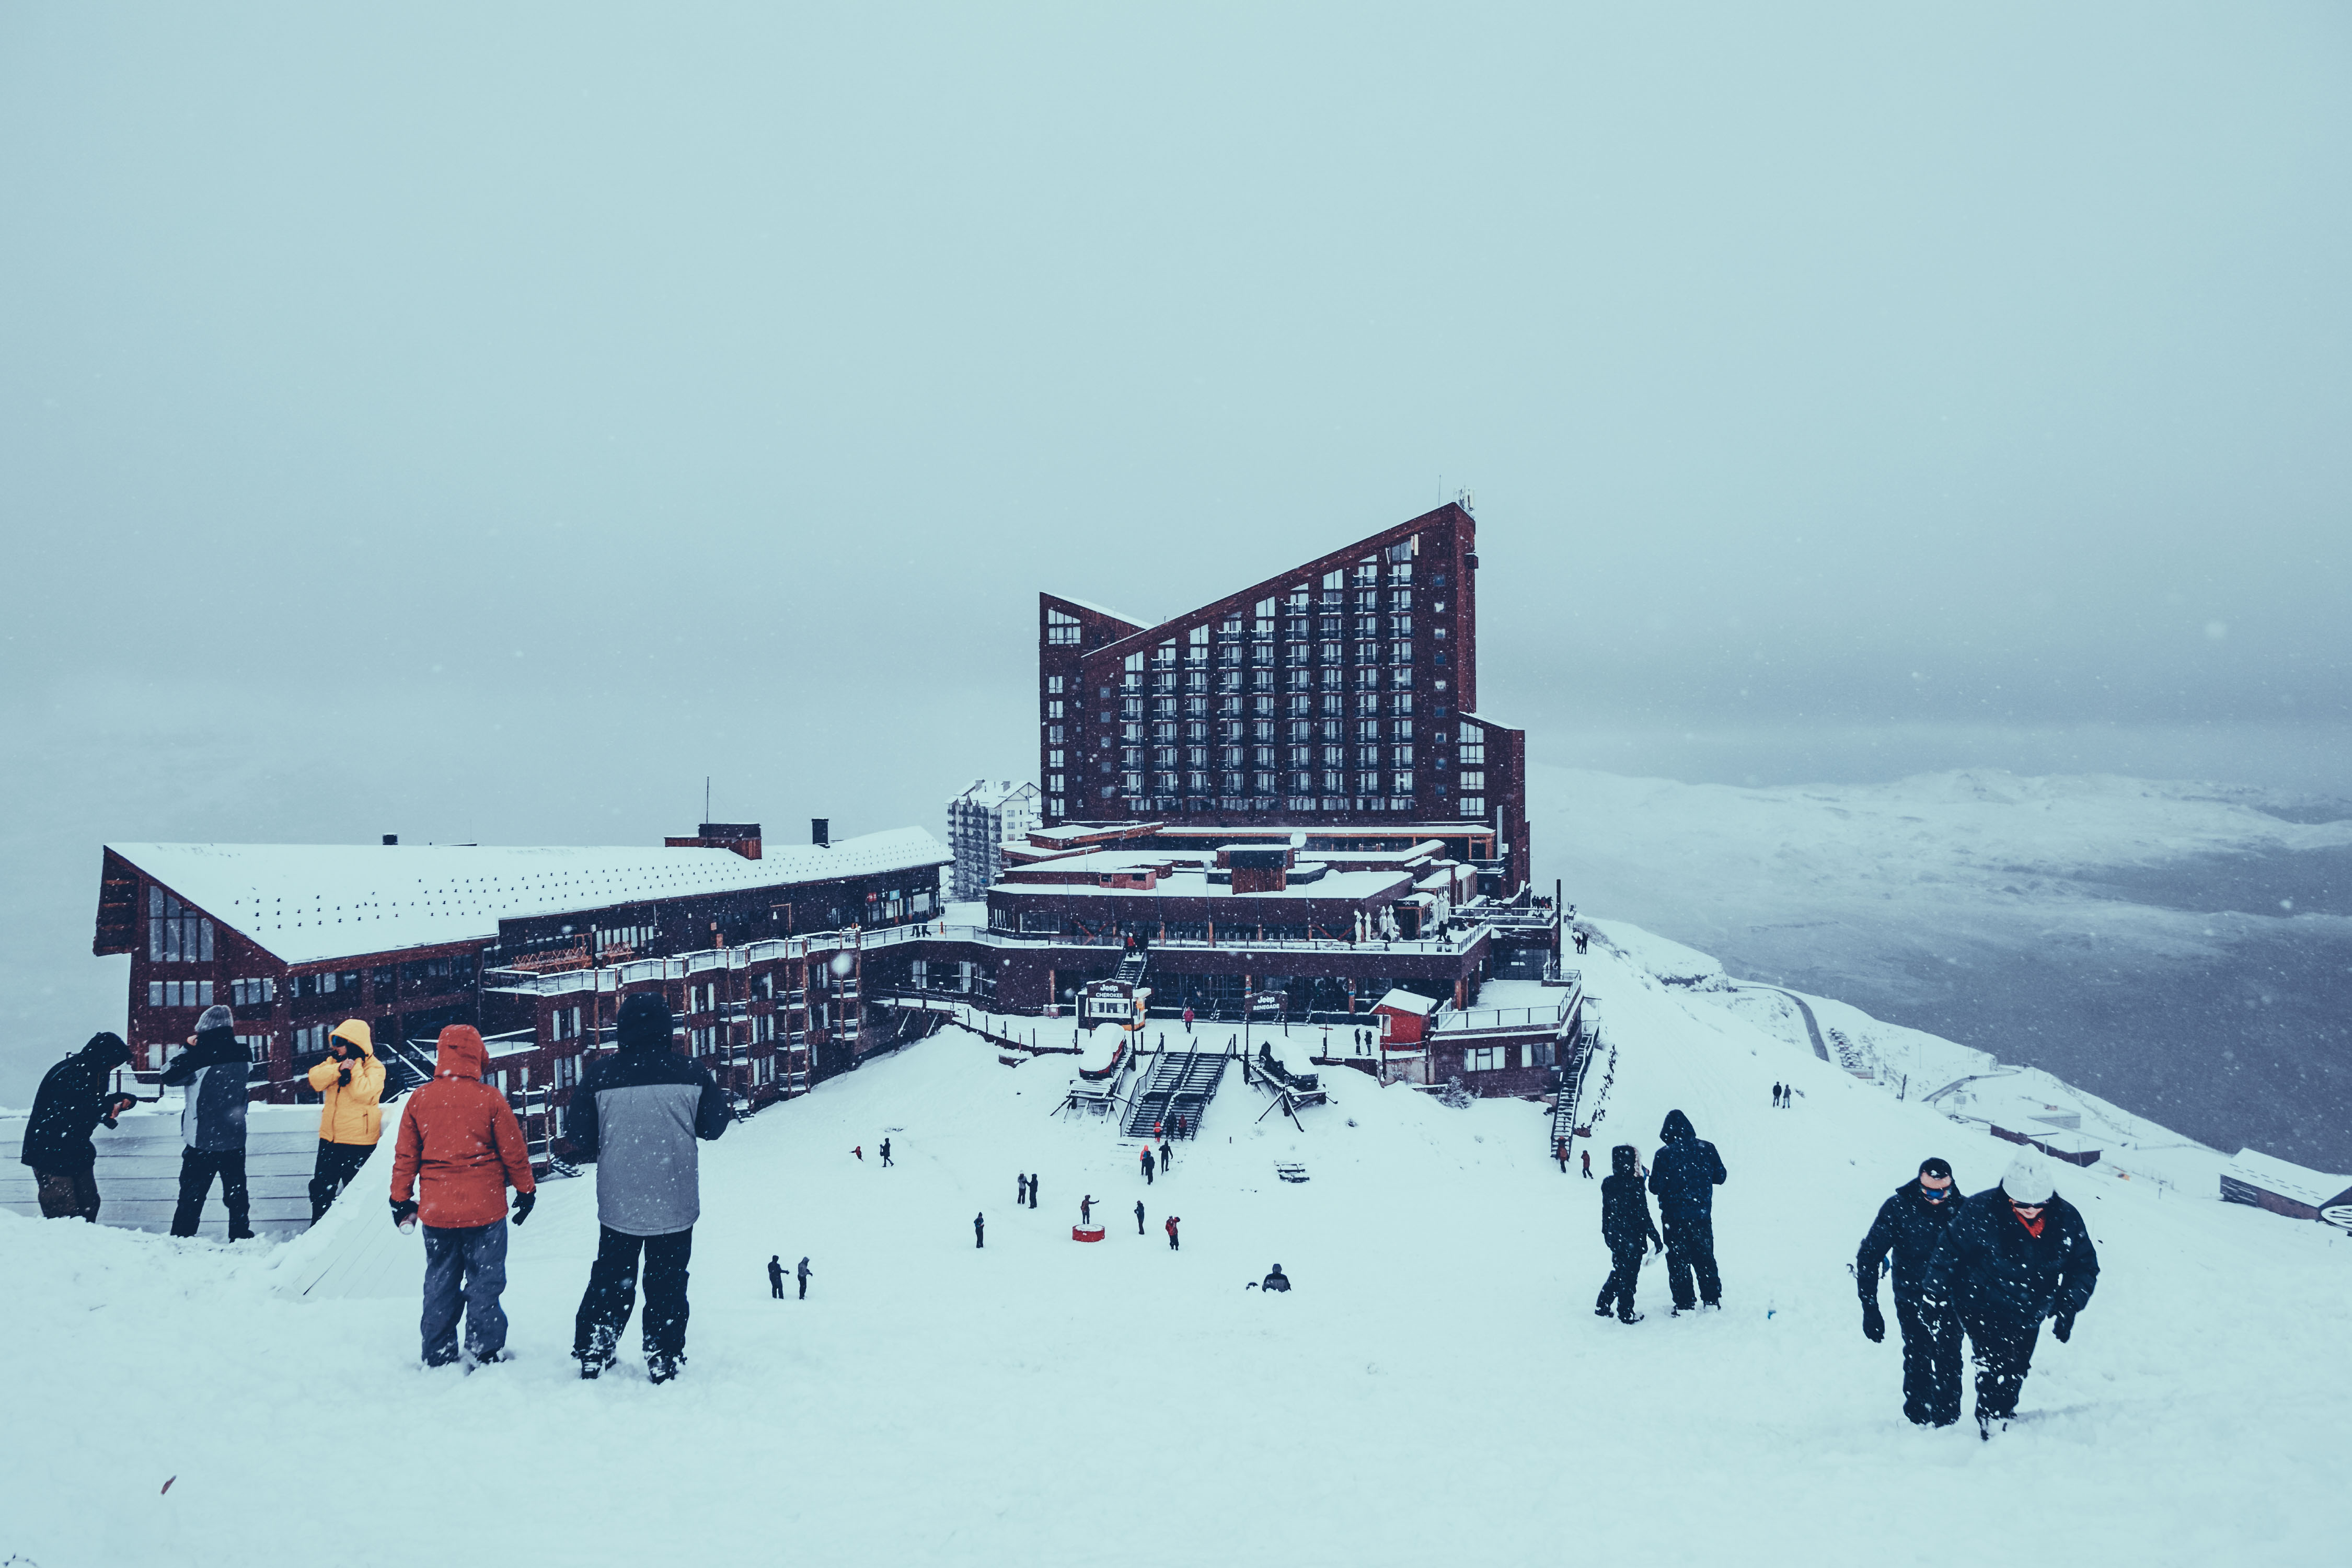 Valle Nevado no Inverno